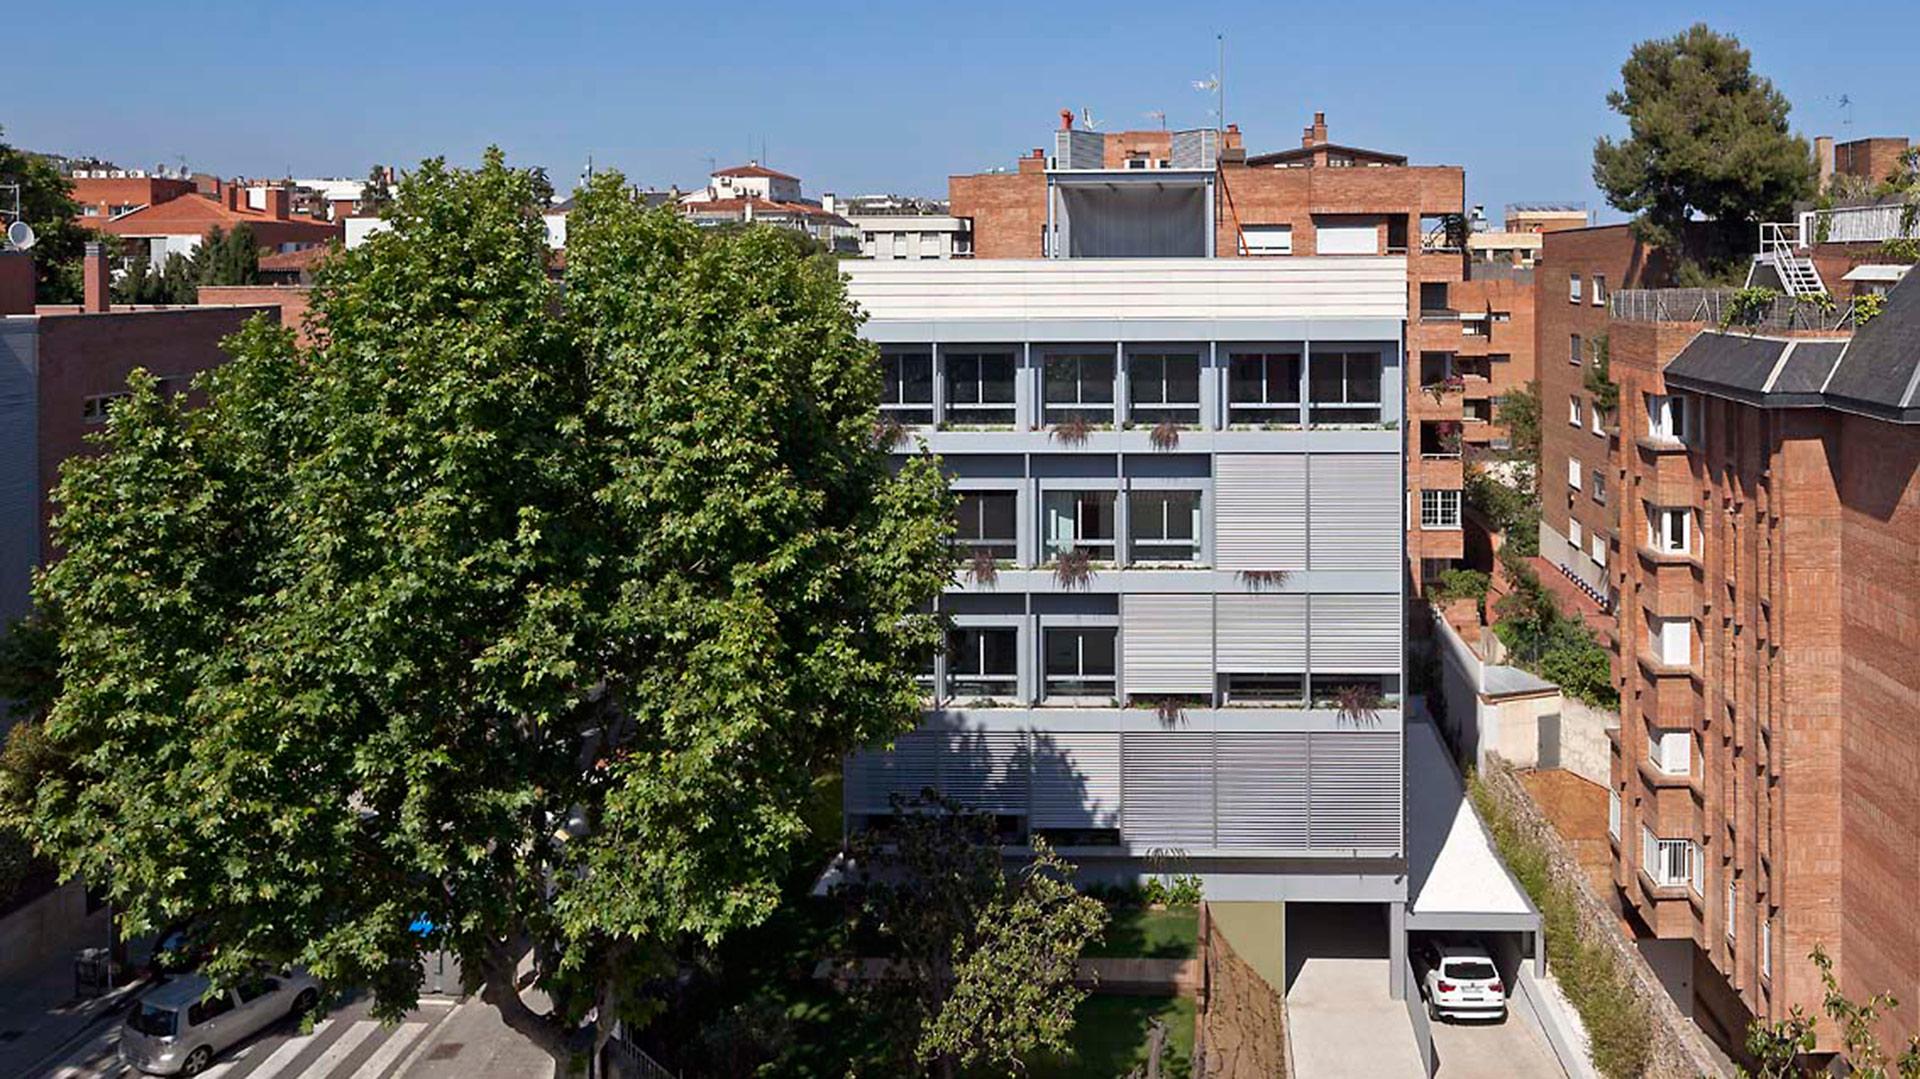 Bloque de viviendas de alta eficiencia energética en Pau AlcoverAngli Barcelona